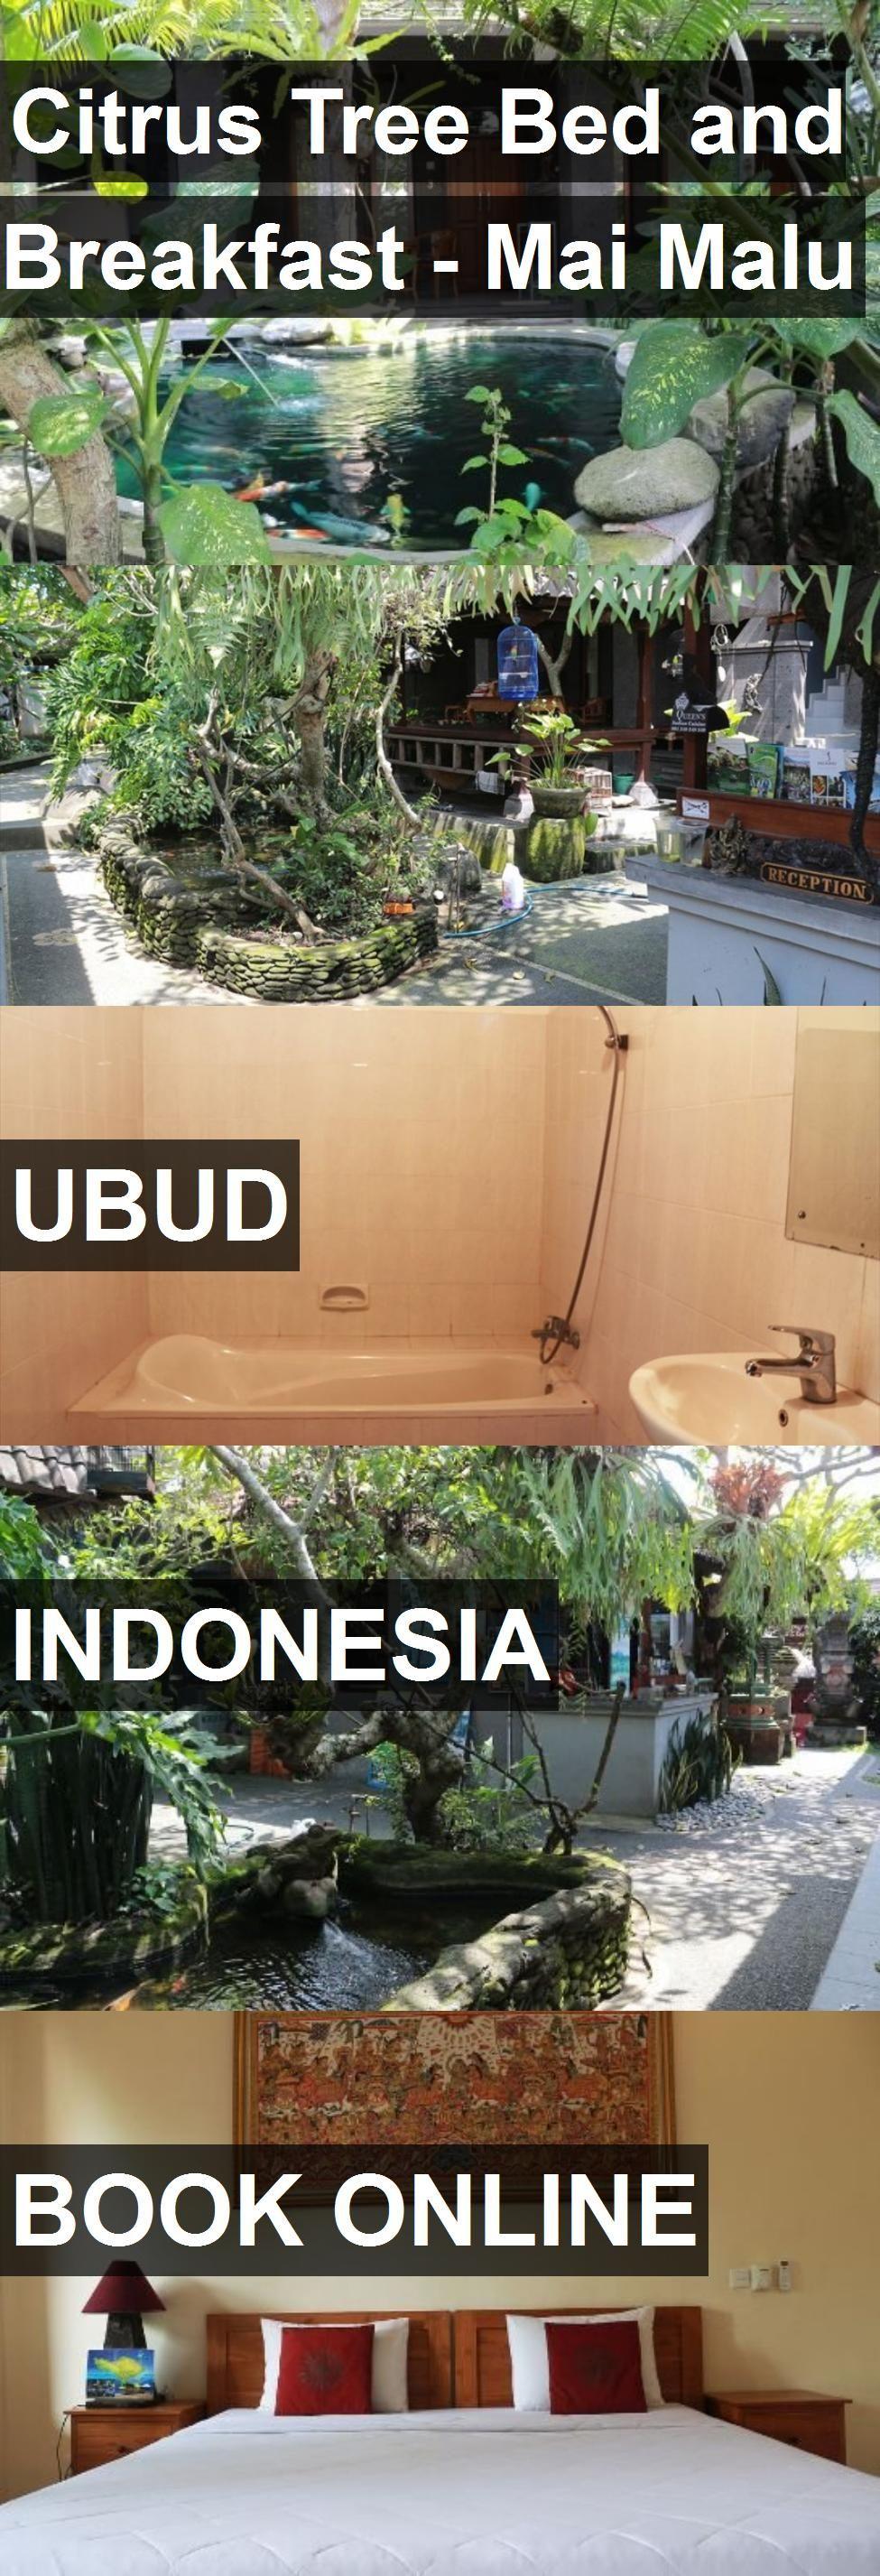 Hotel Citrus Tree Bed and Breakfast Mai Malu in Ubud